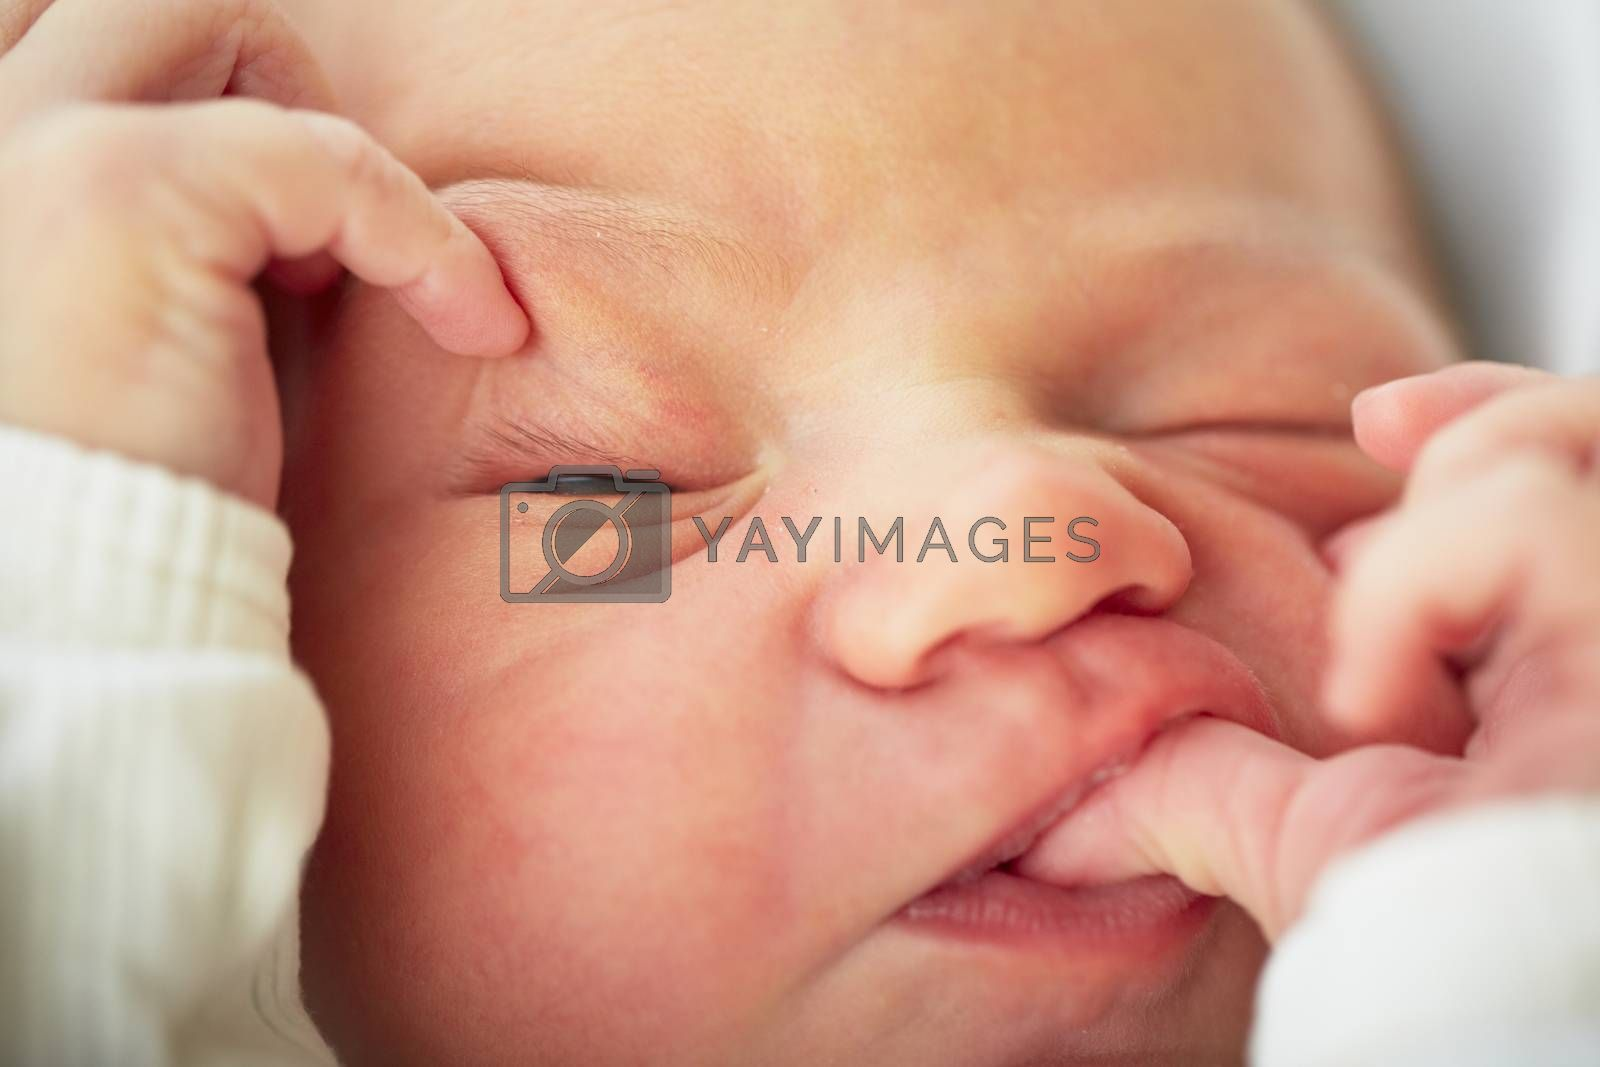 Newborn is baby sleeping - selective focus